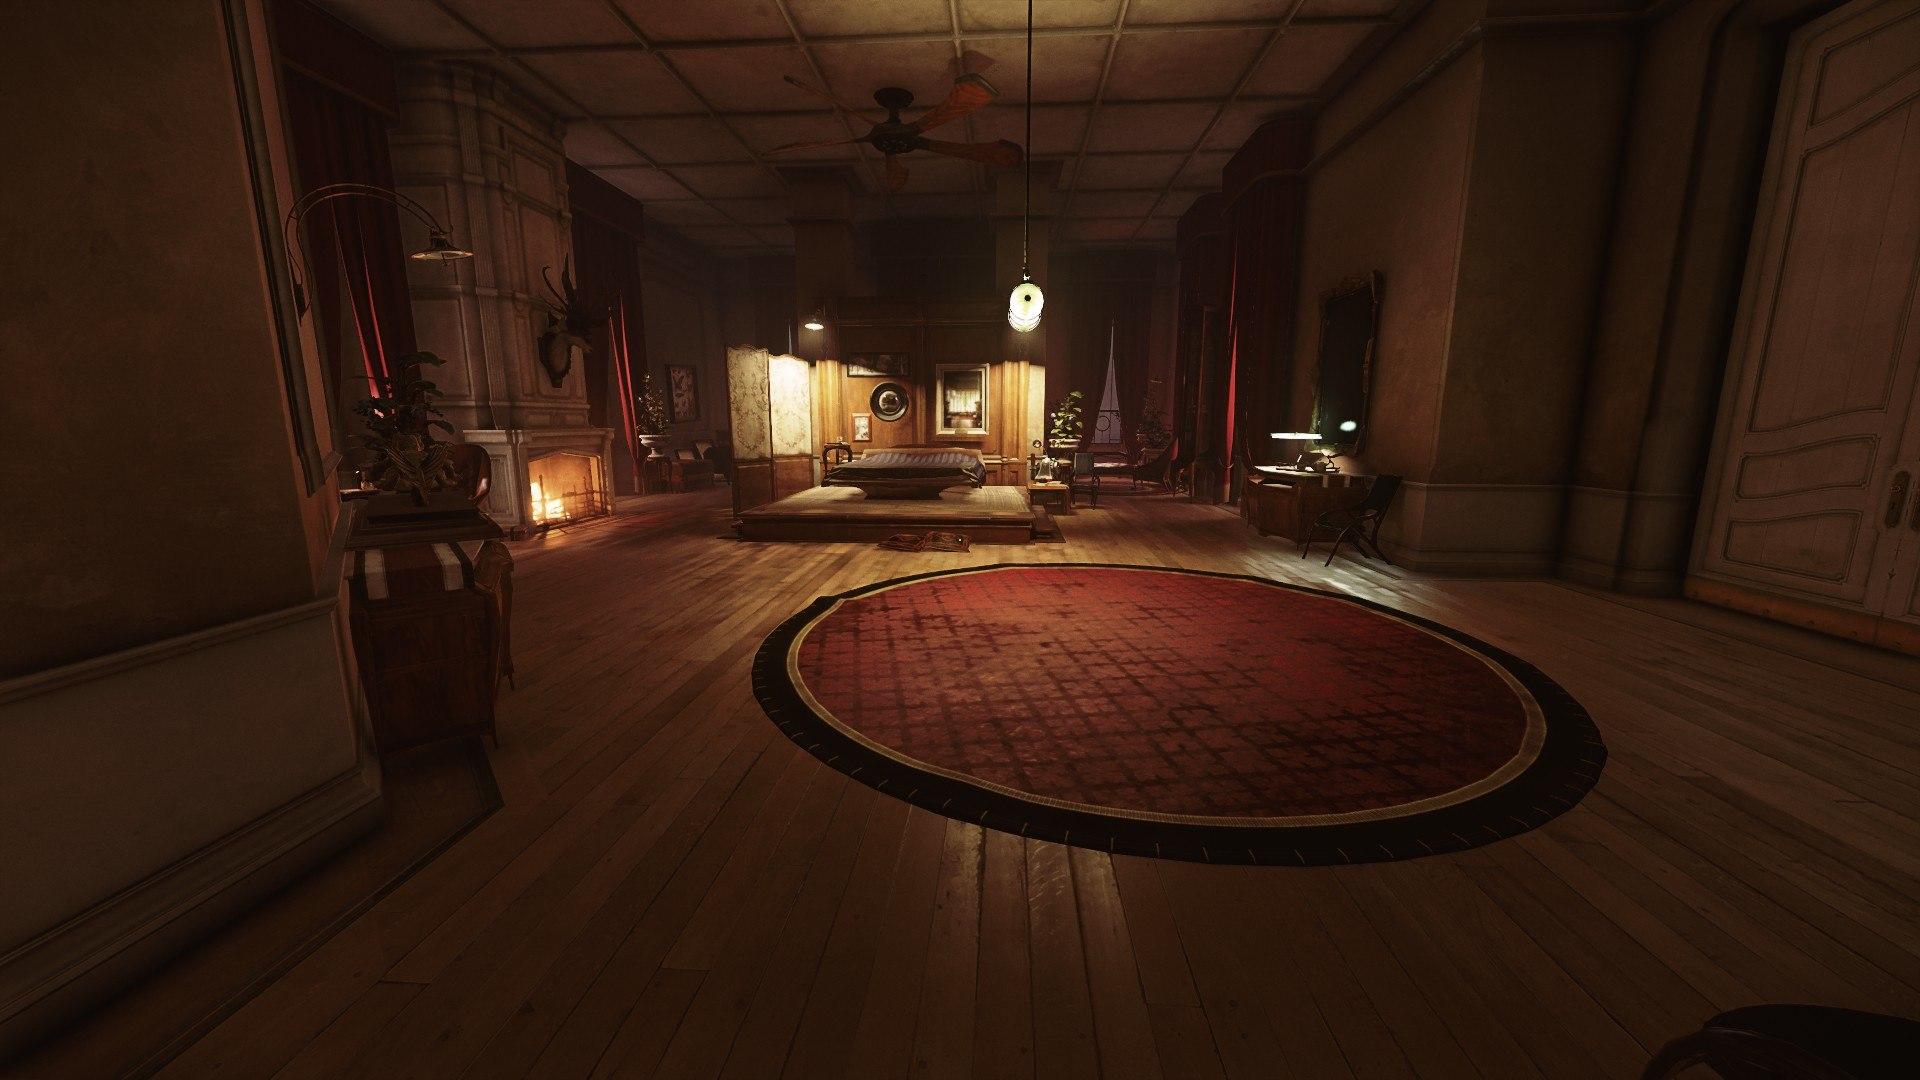 kjnjk.jpg - Dishonored 2